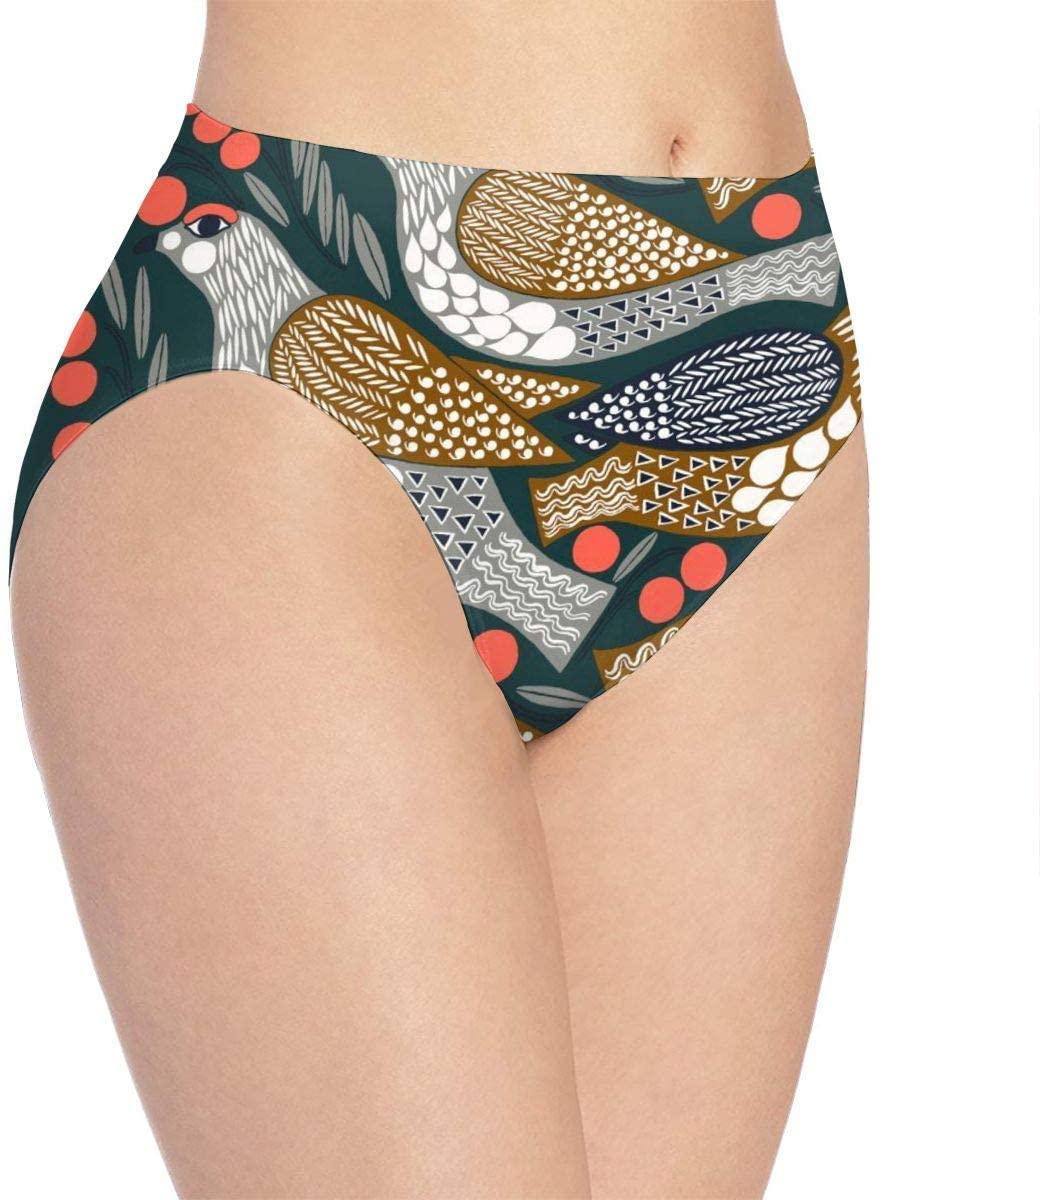 Kjaoi 3D Print Soft Womens Underwear, Retro Birds Fashion Flirty Sexy Ladys Panties Briefs